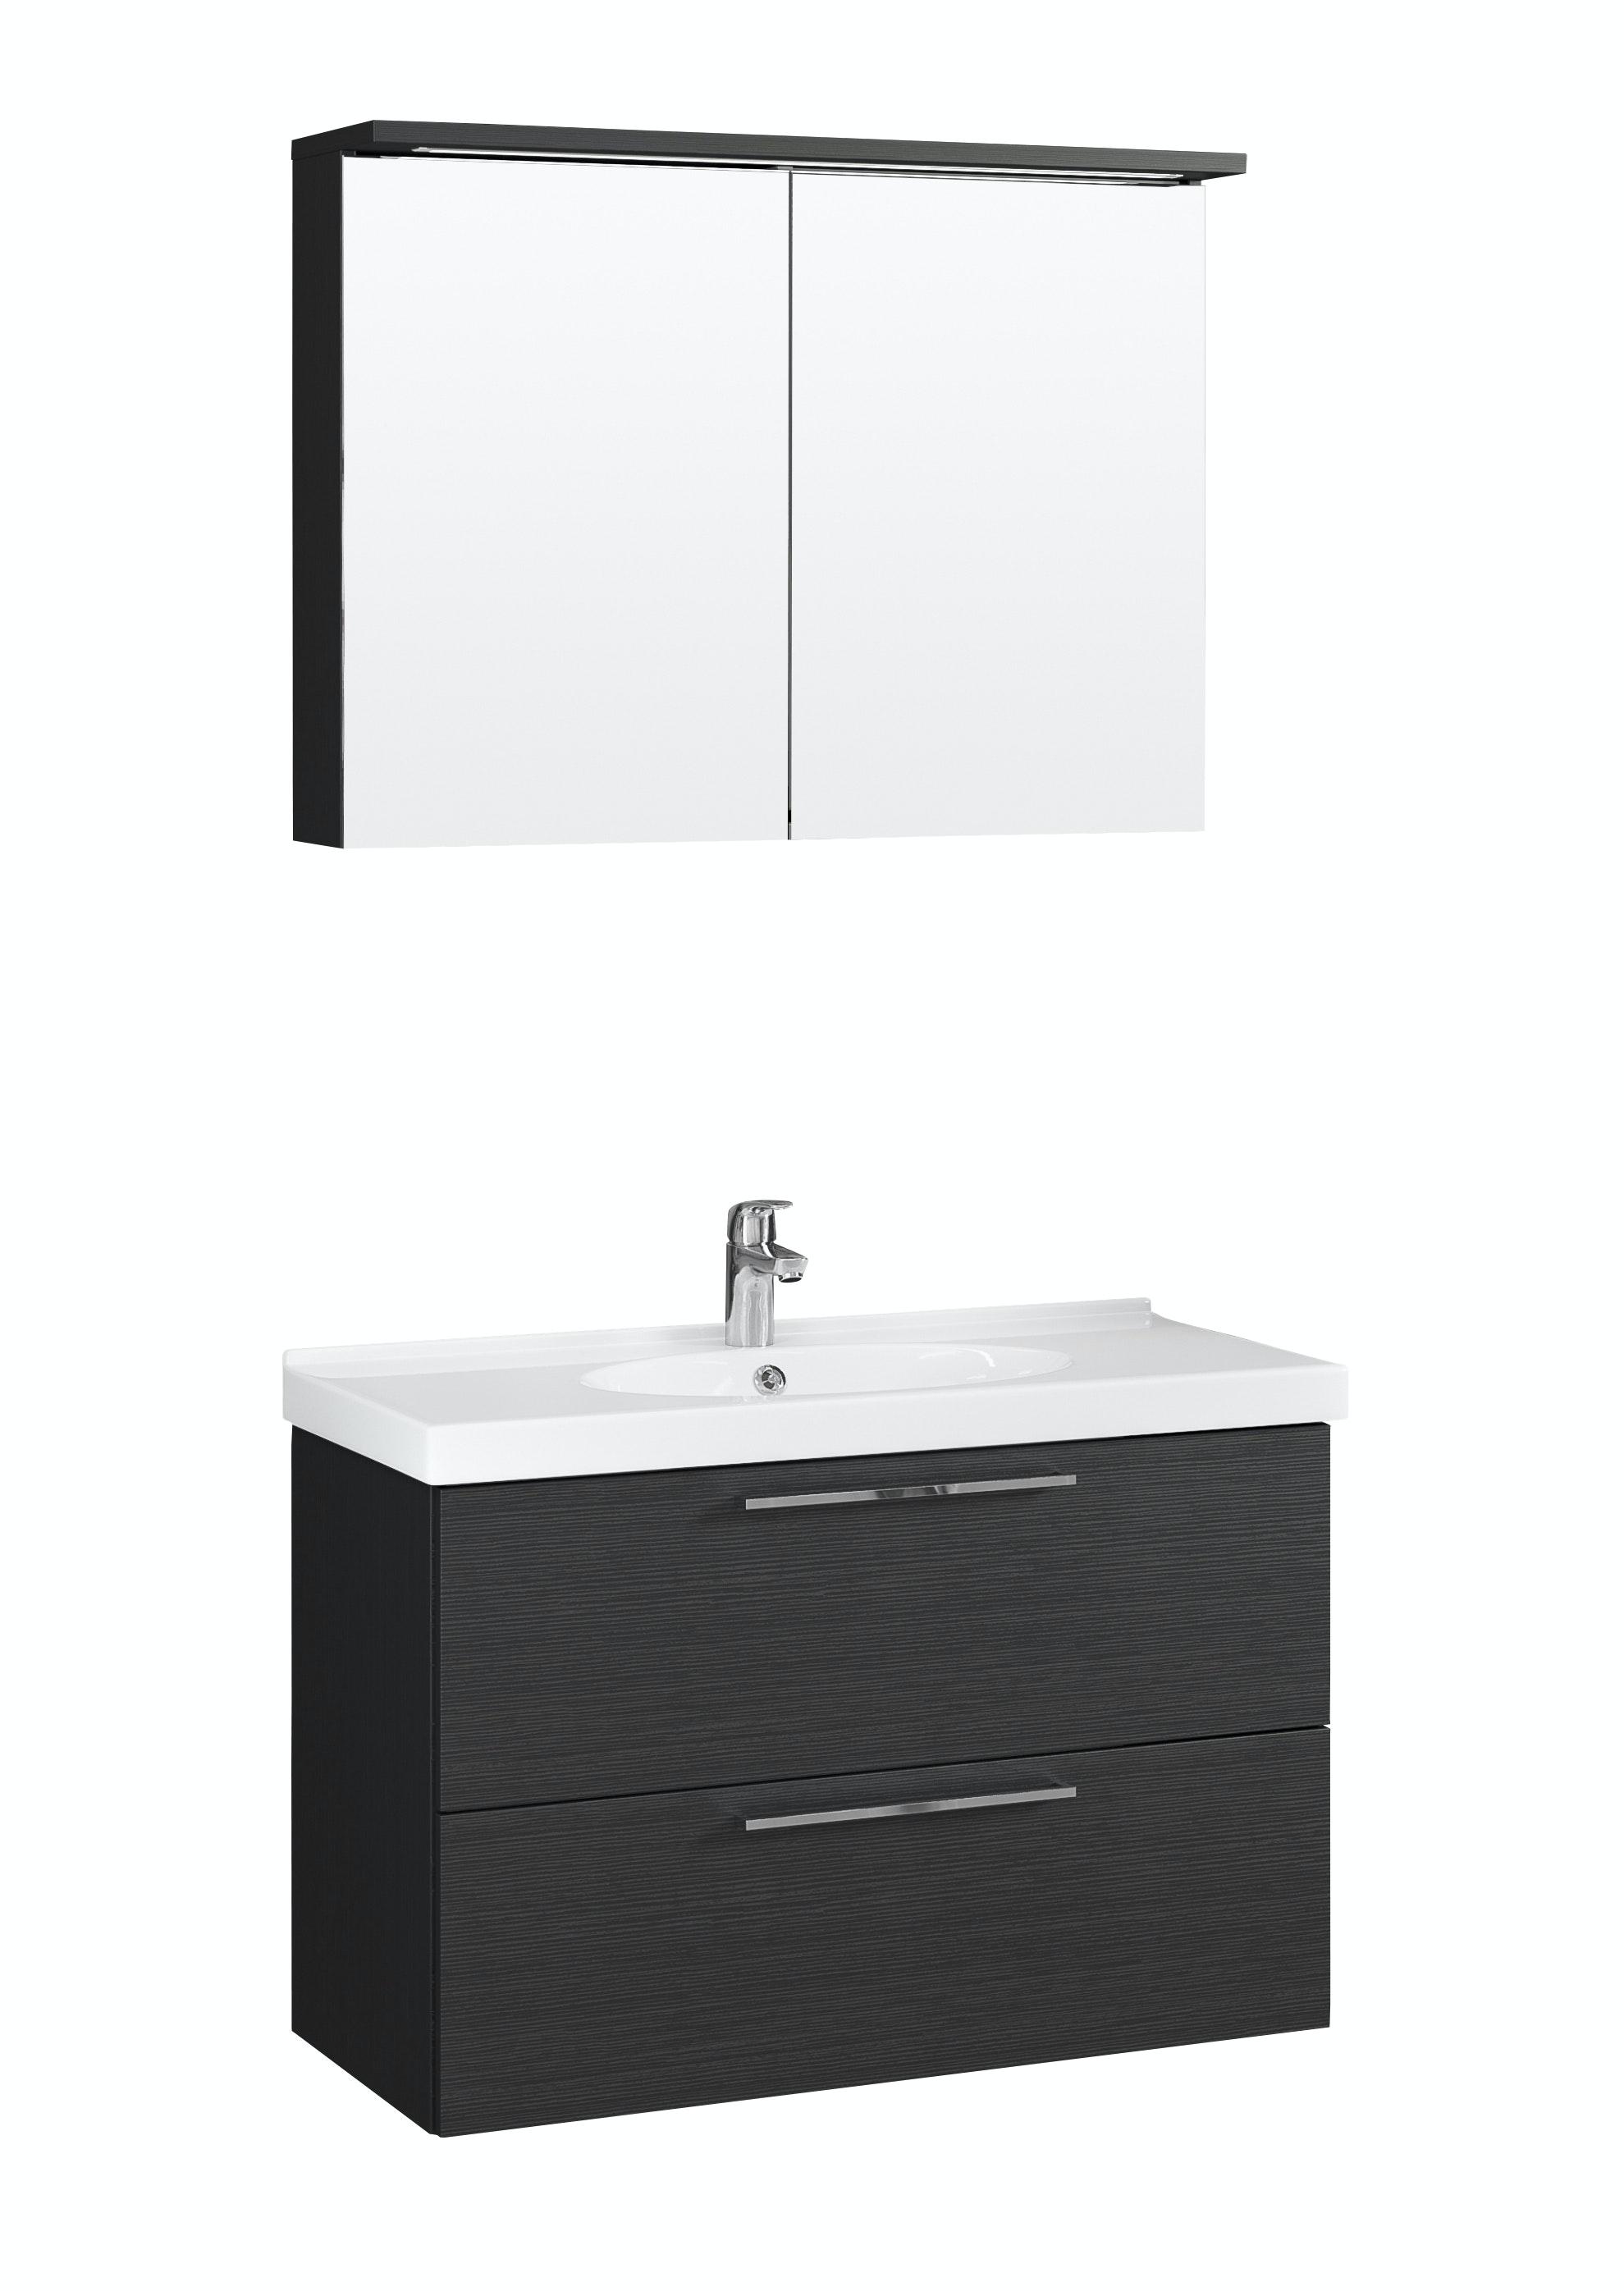 Möbelpaket Temal Trend 82X50 Svart Med Spegelskåp